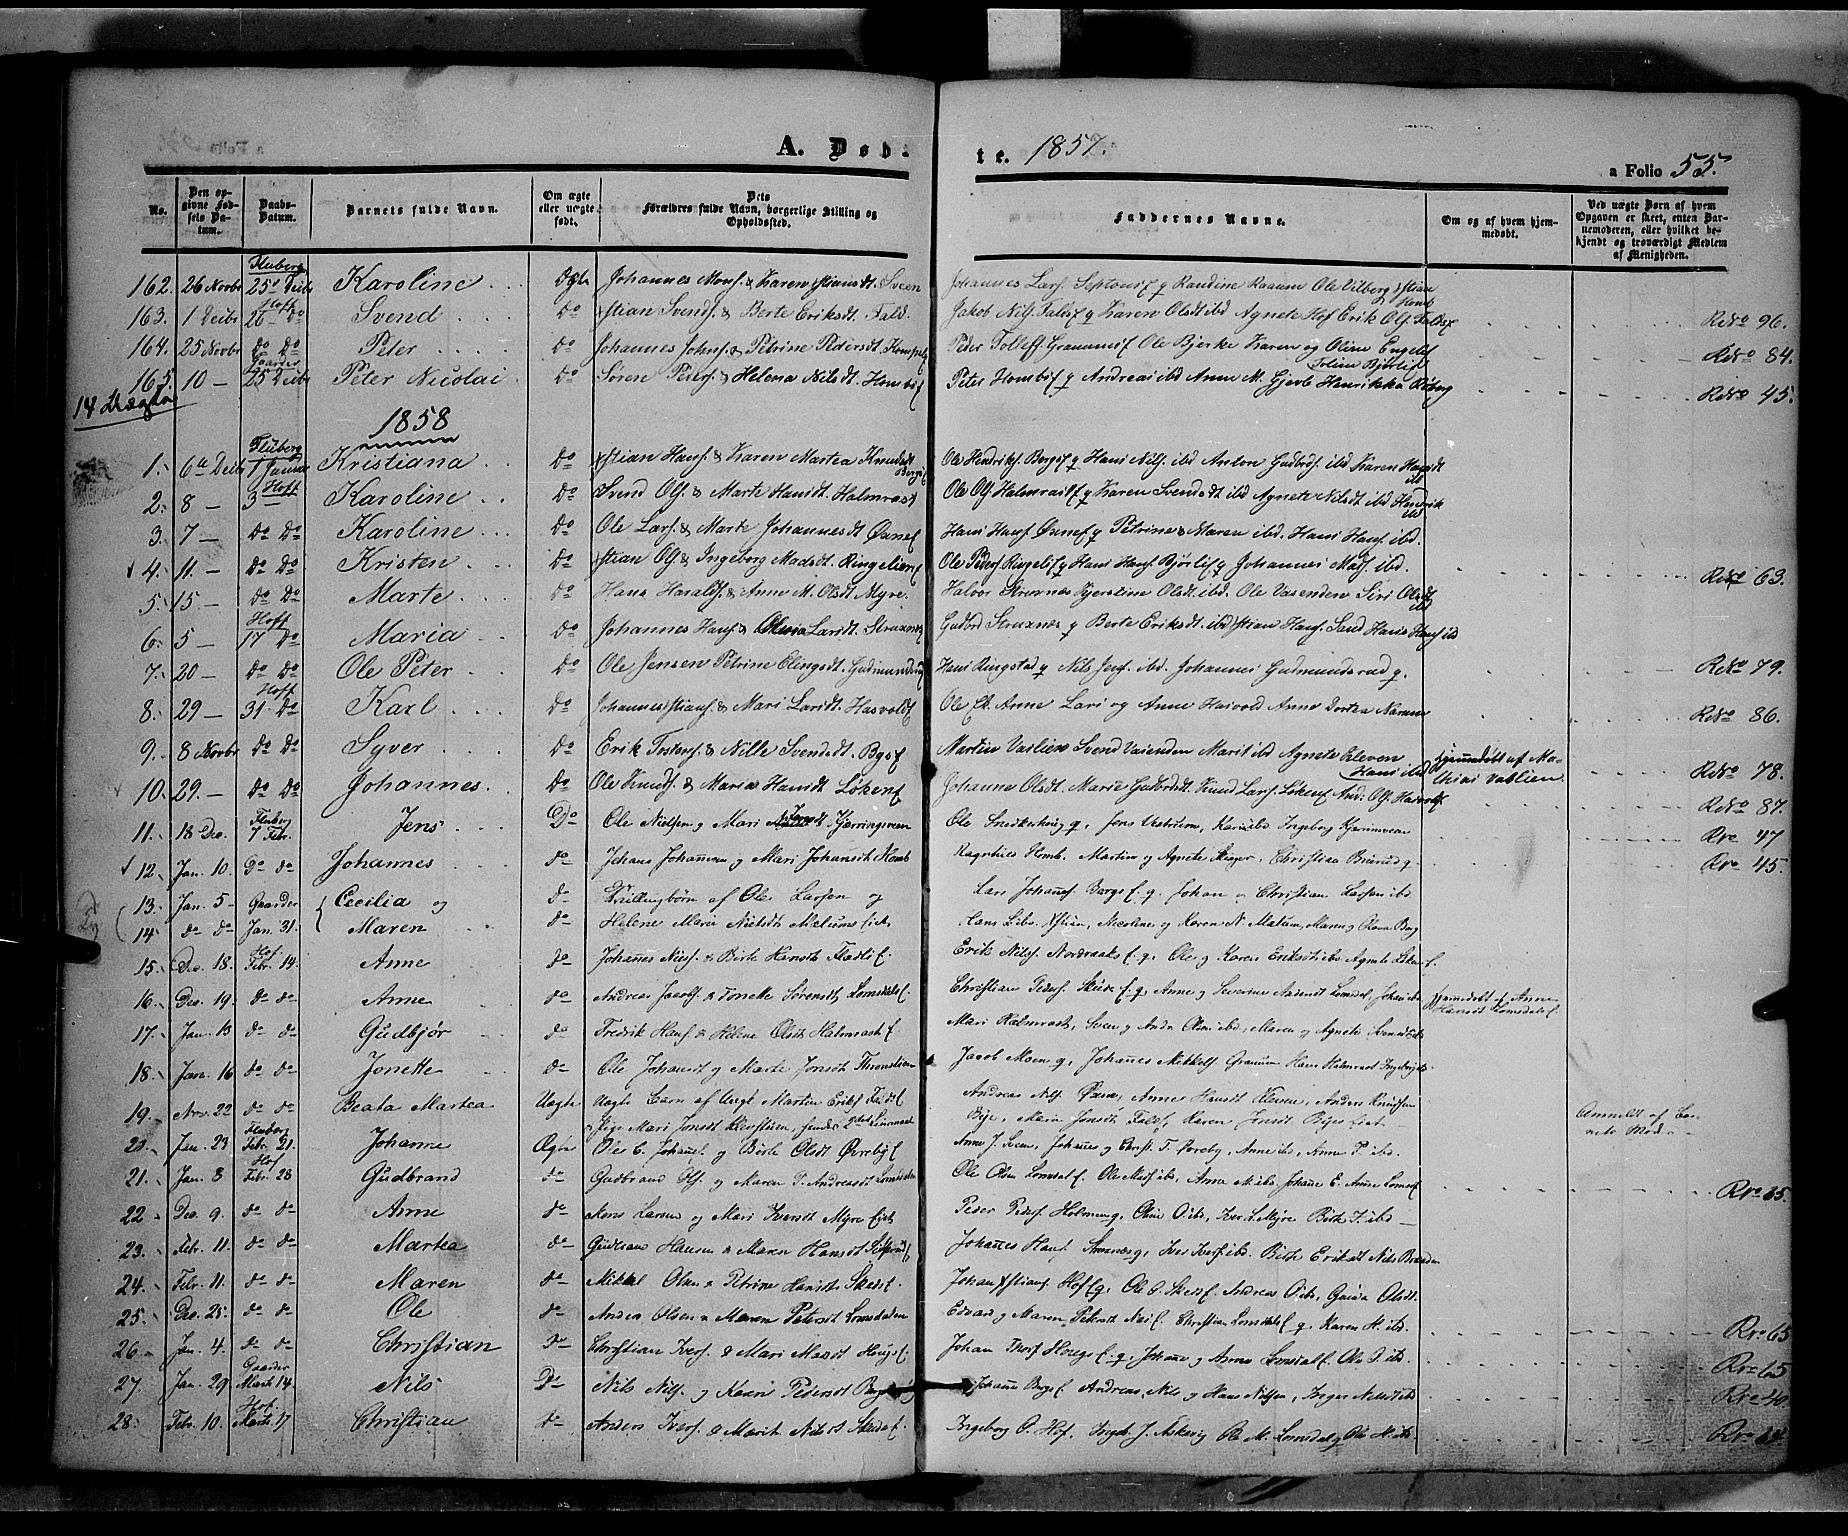 SAH, Land prestekontor, Ministerialbok nr. 9, 1847-1859, s. 55